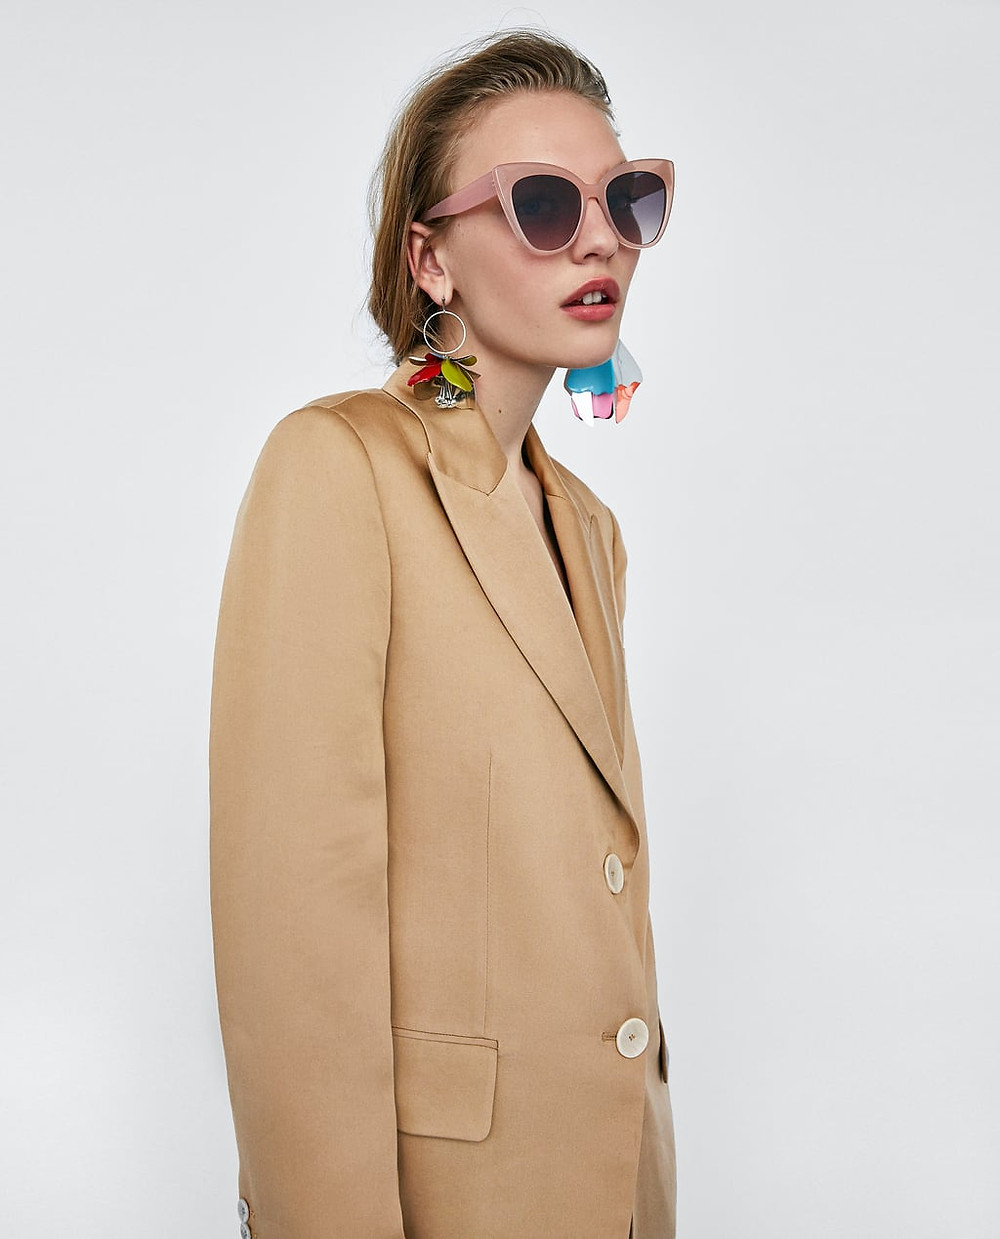 Zara Resin Cateye Sunglasses $25.90